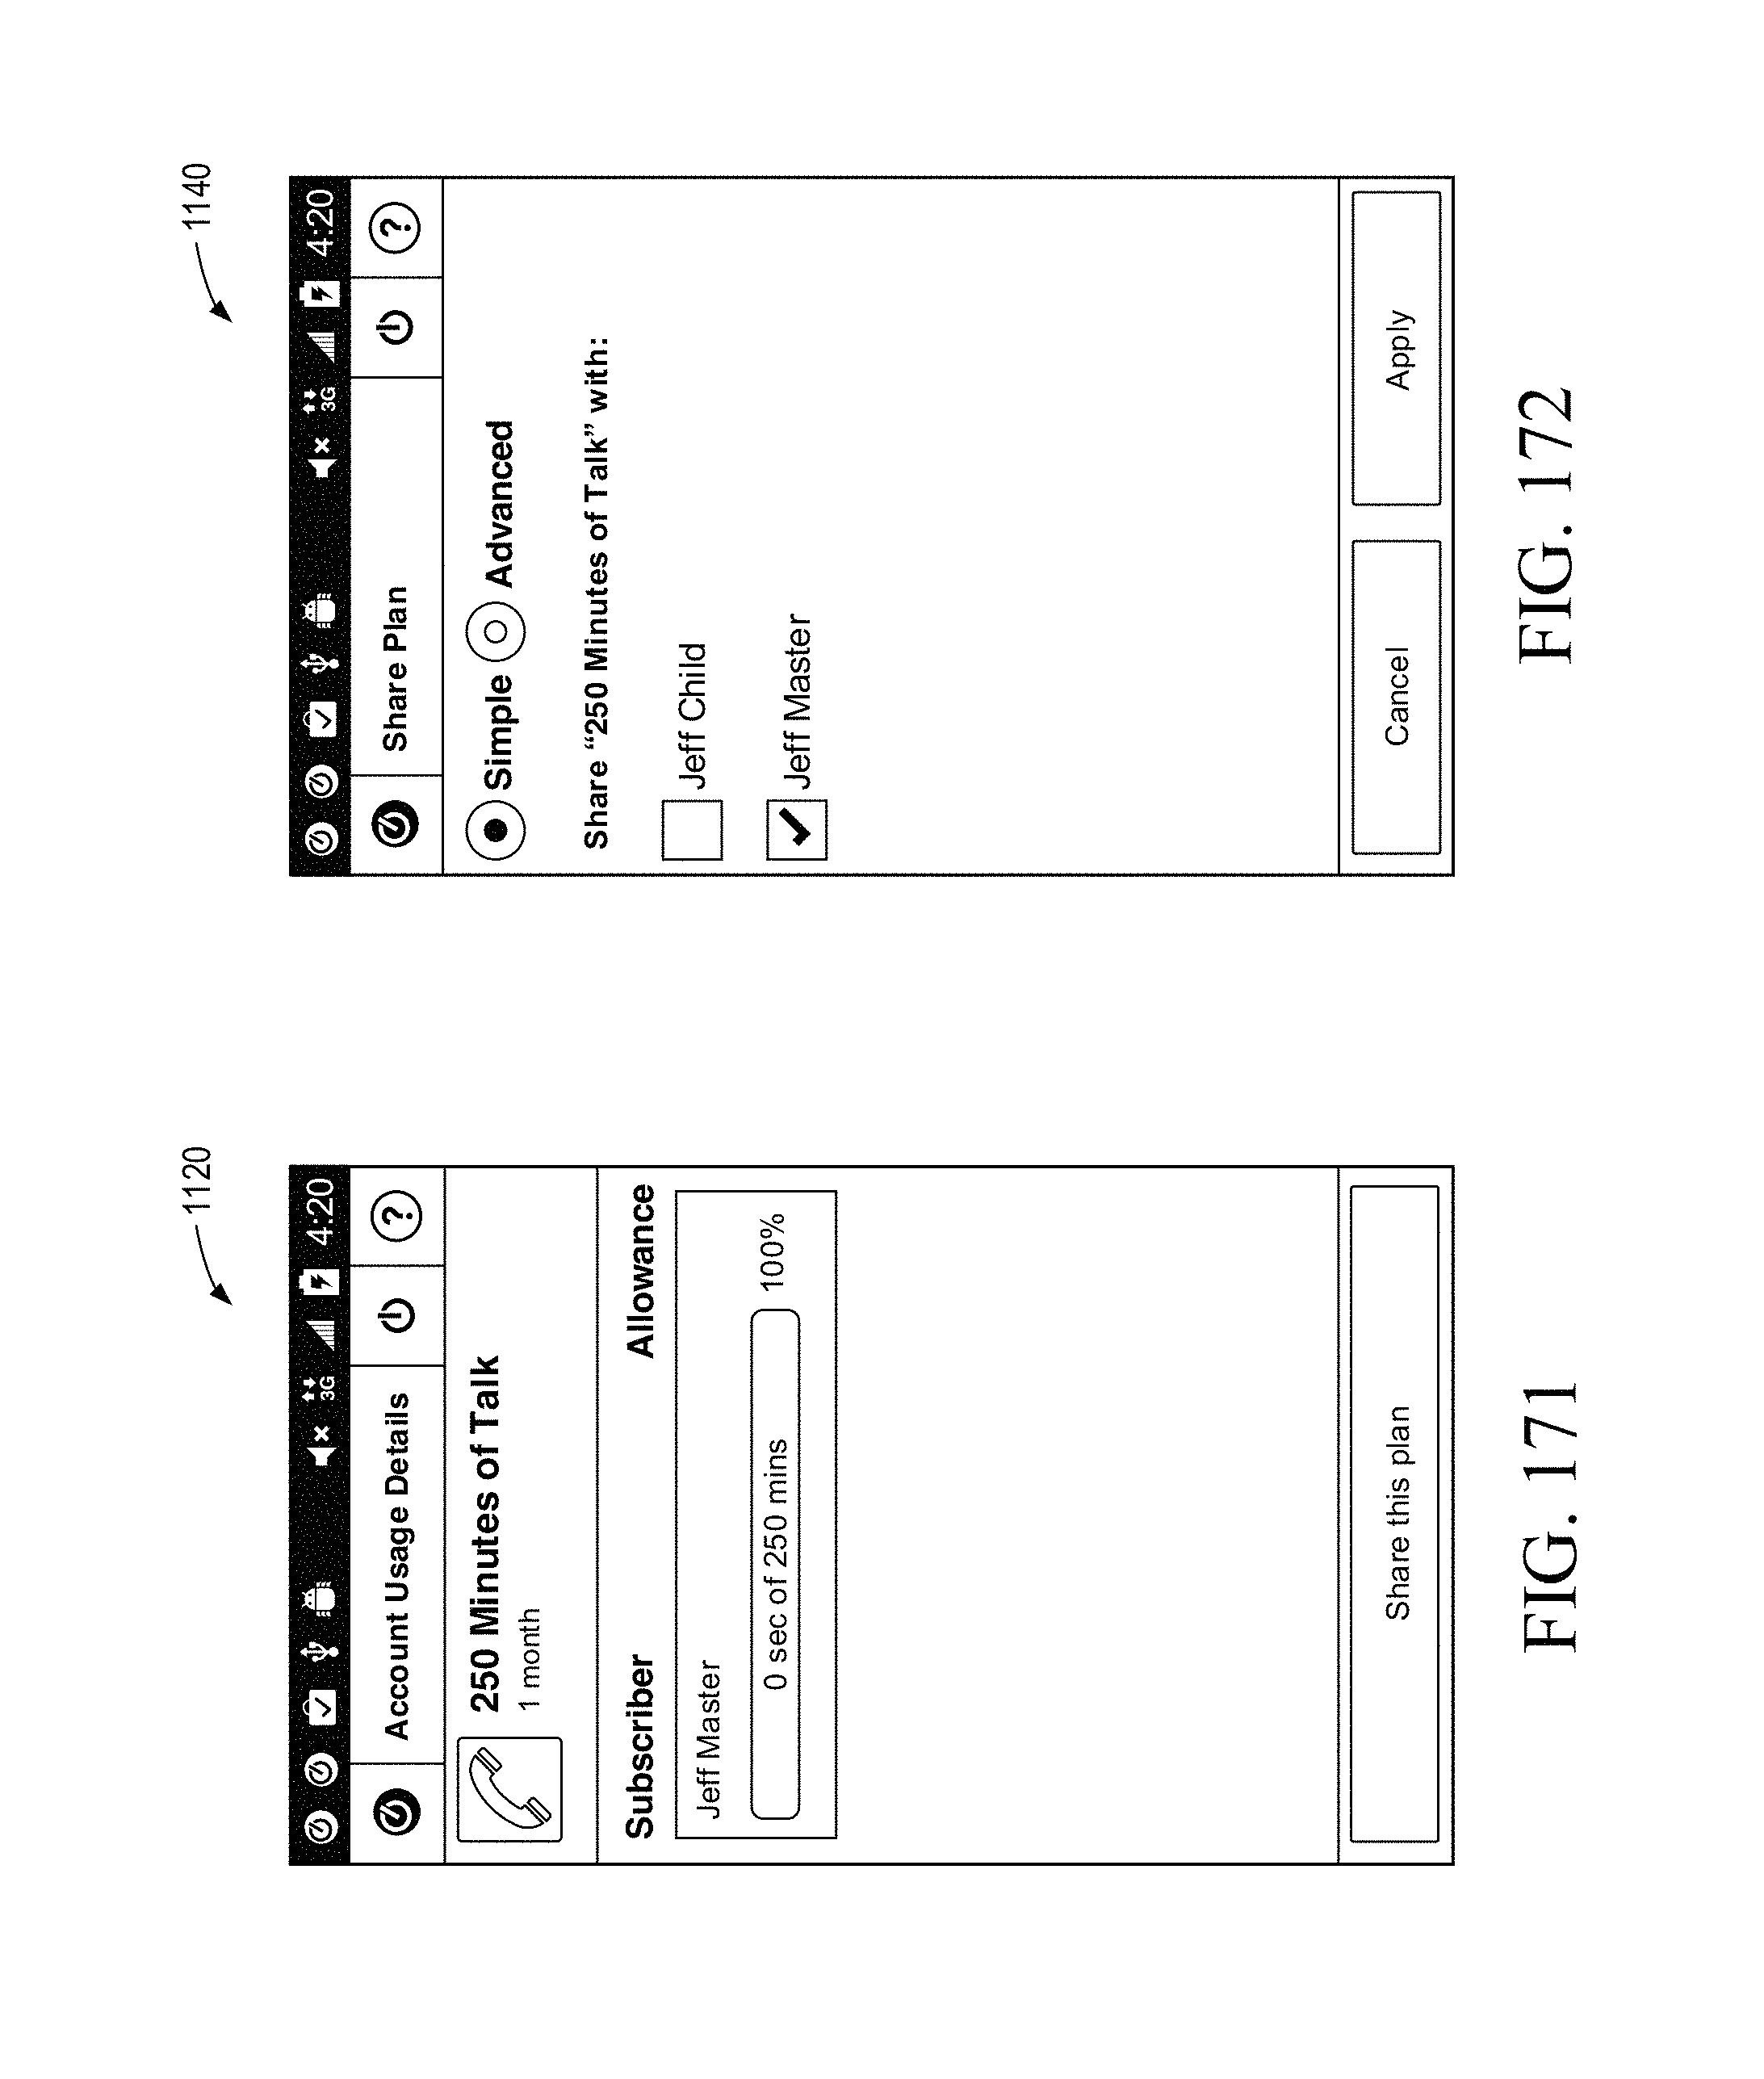 Patent US 9,955,332 B2